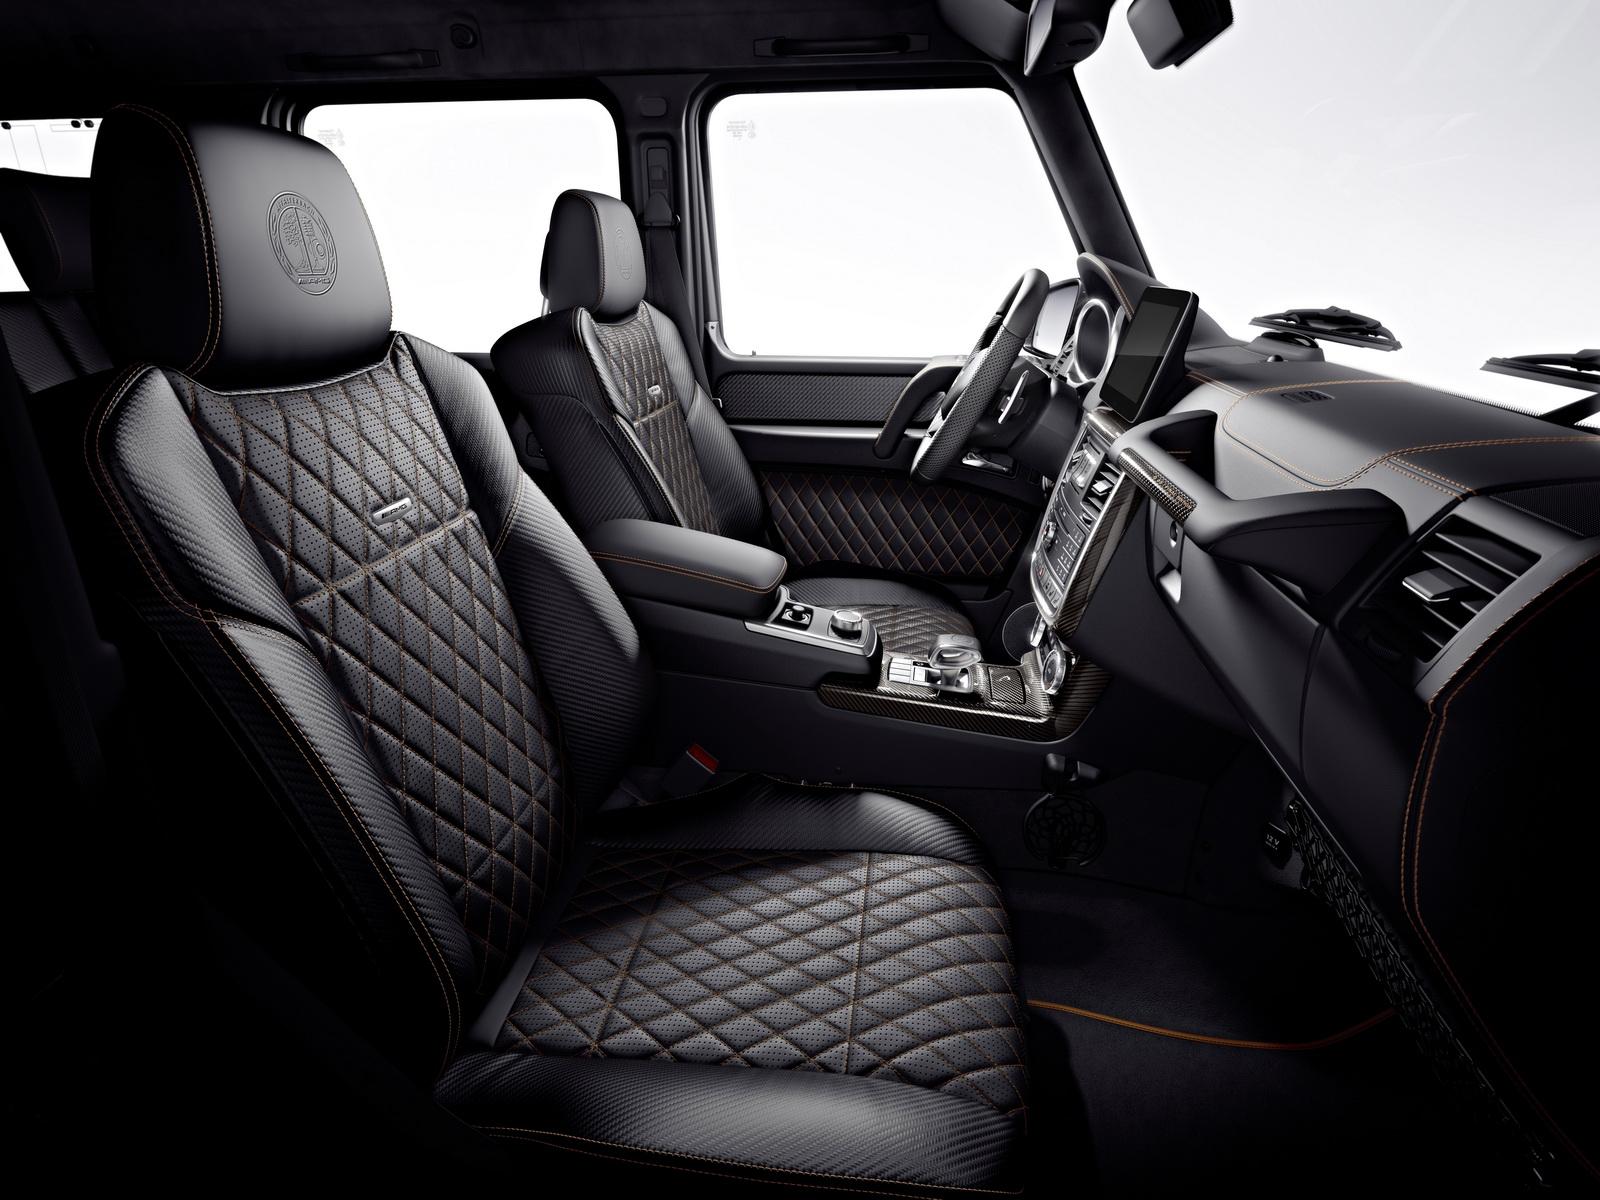 mercedes-amg-g65-final-edition-interior.jpg